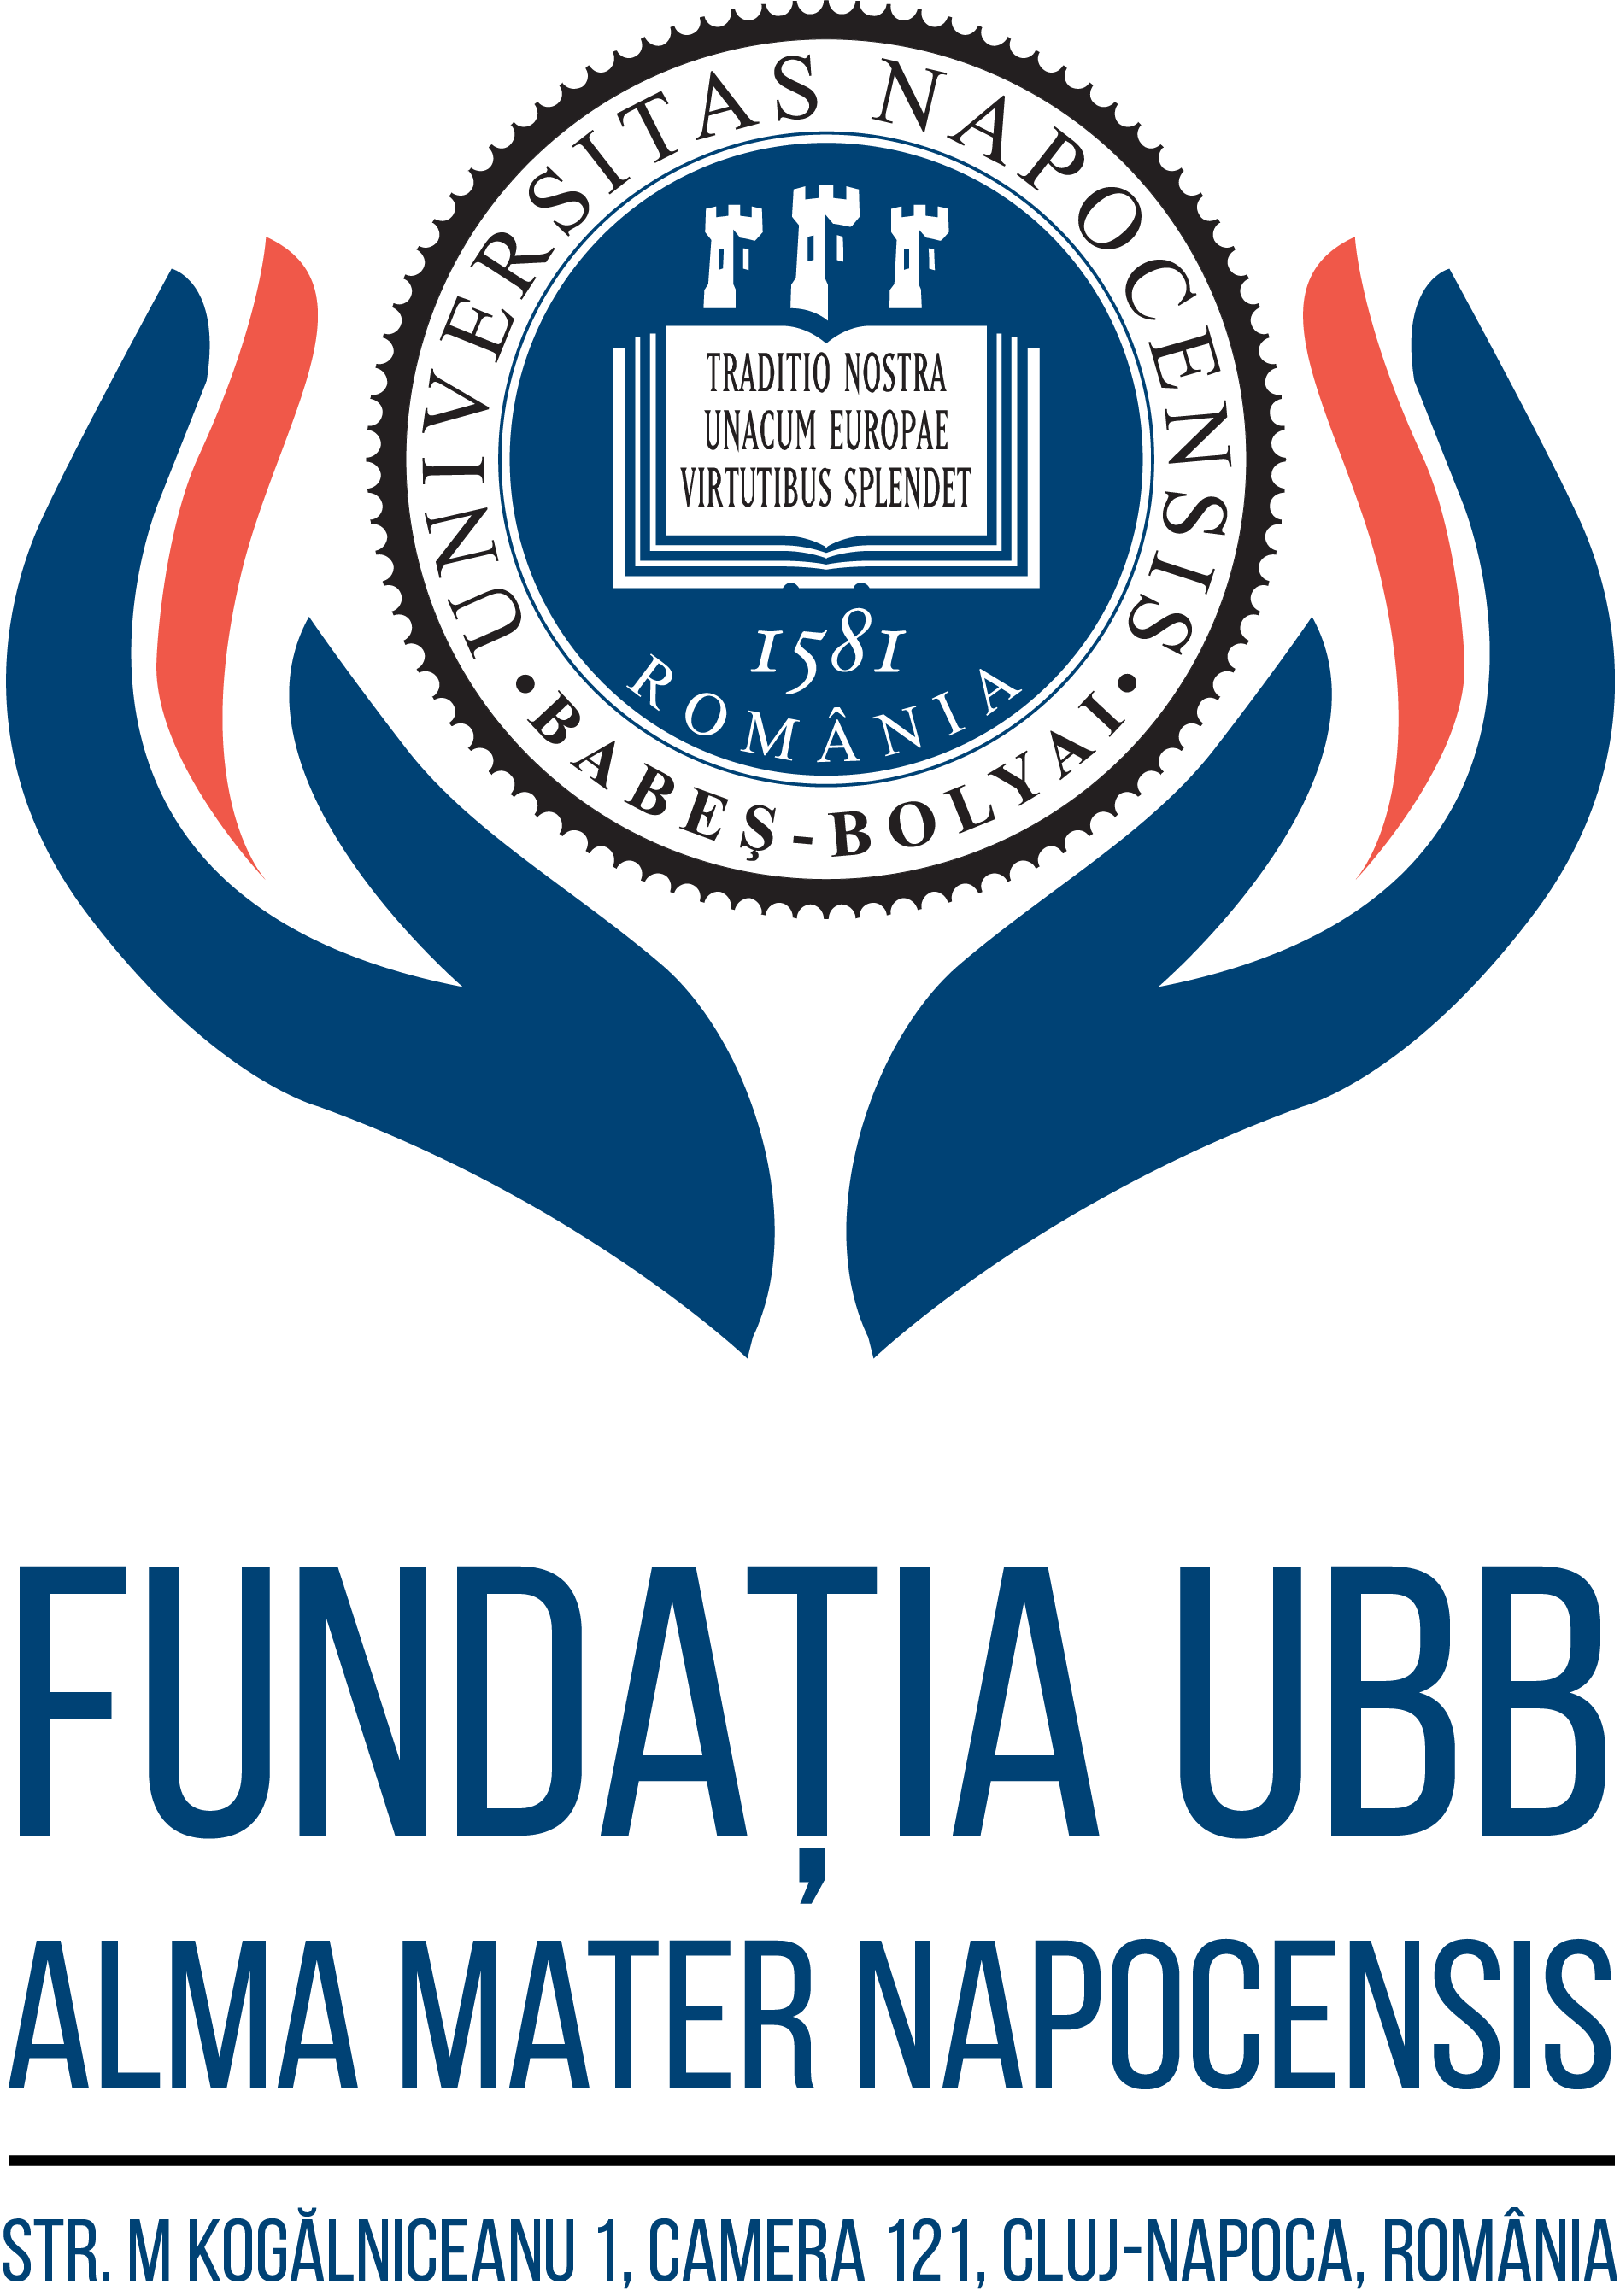 Fundația Alma Mater Napocensis logo